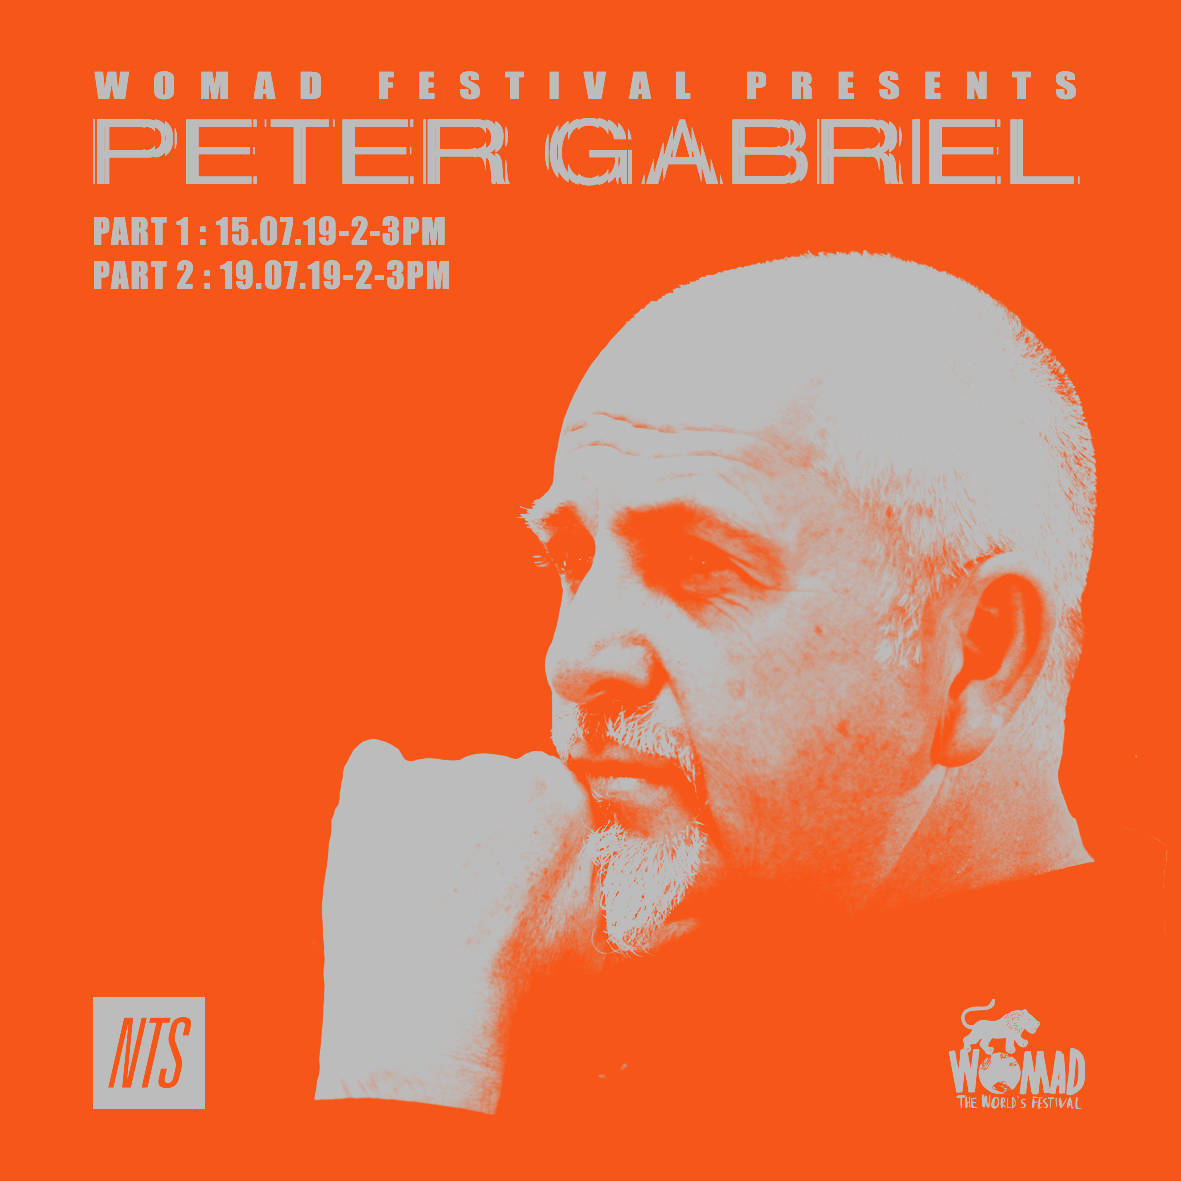 Peter Gabriel residency on NTS - July 15 & 19, 2019 - Music